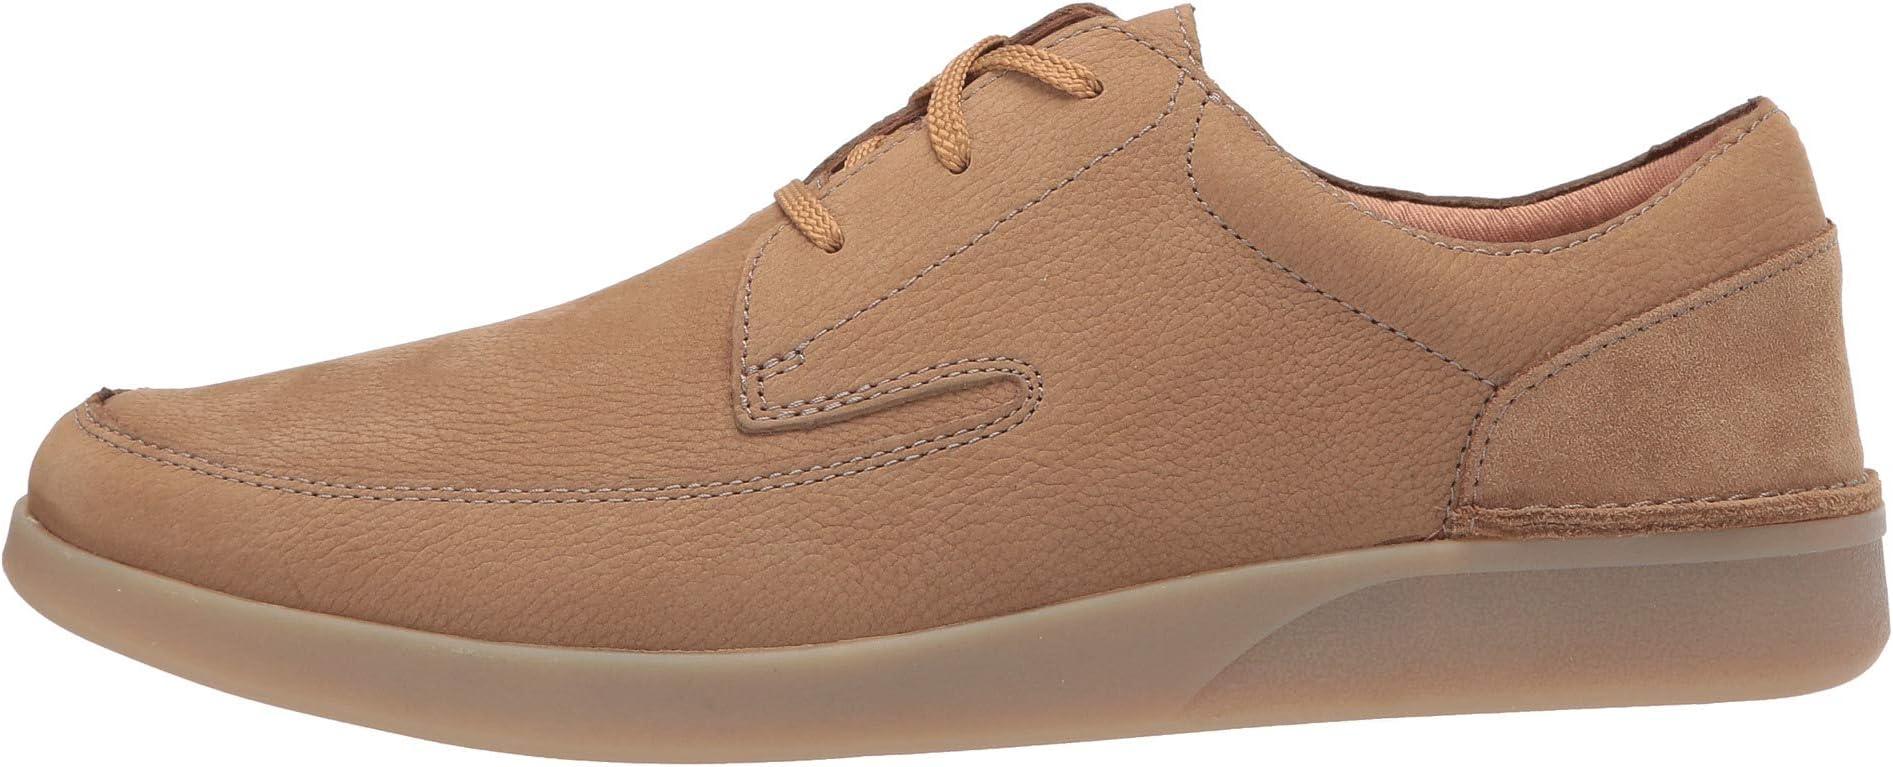 Clarks Oakland Craft | Men's shoes | 2020 Newest